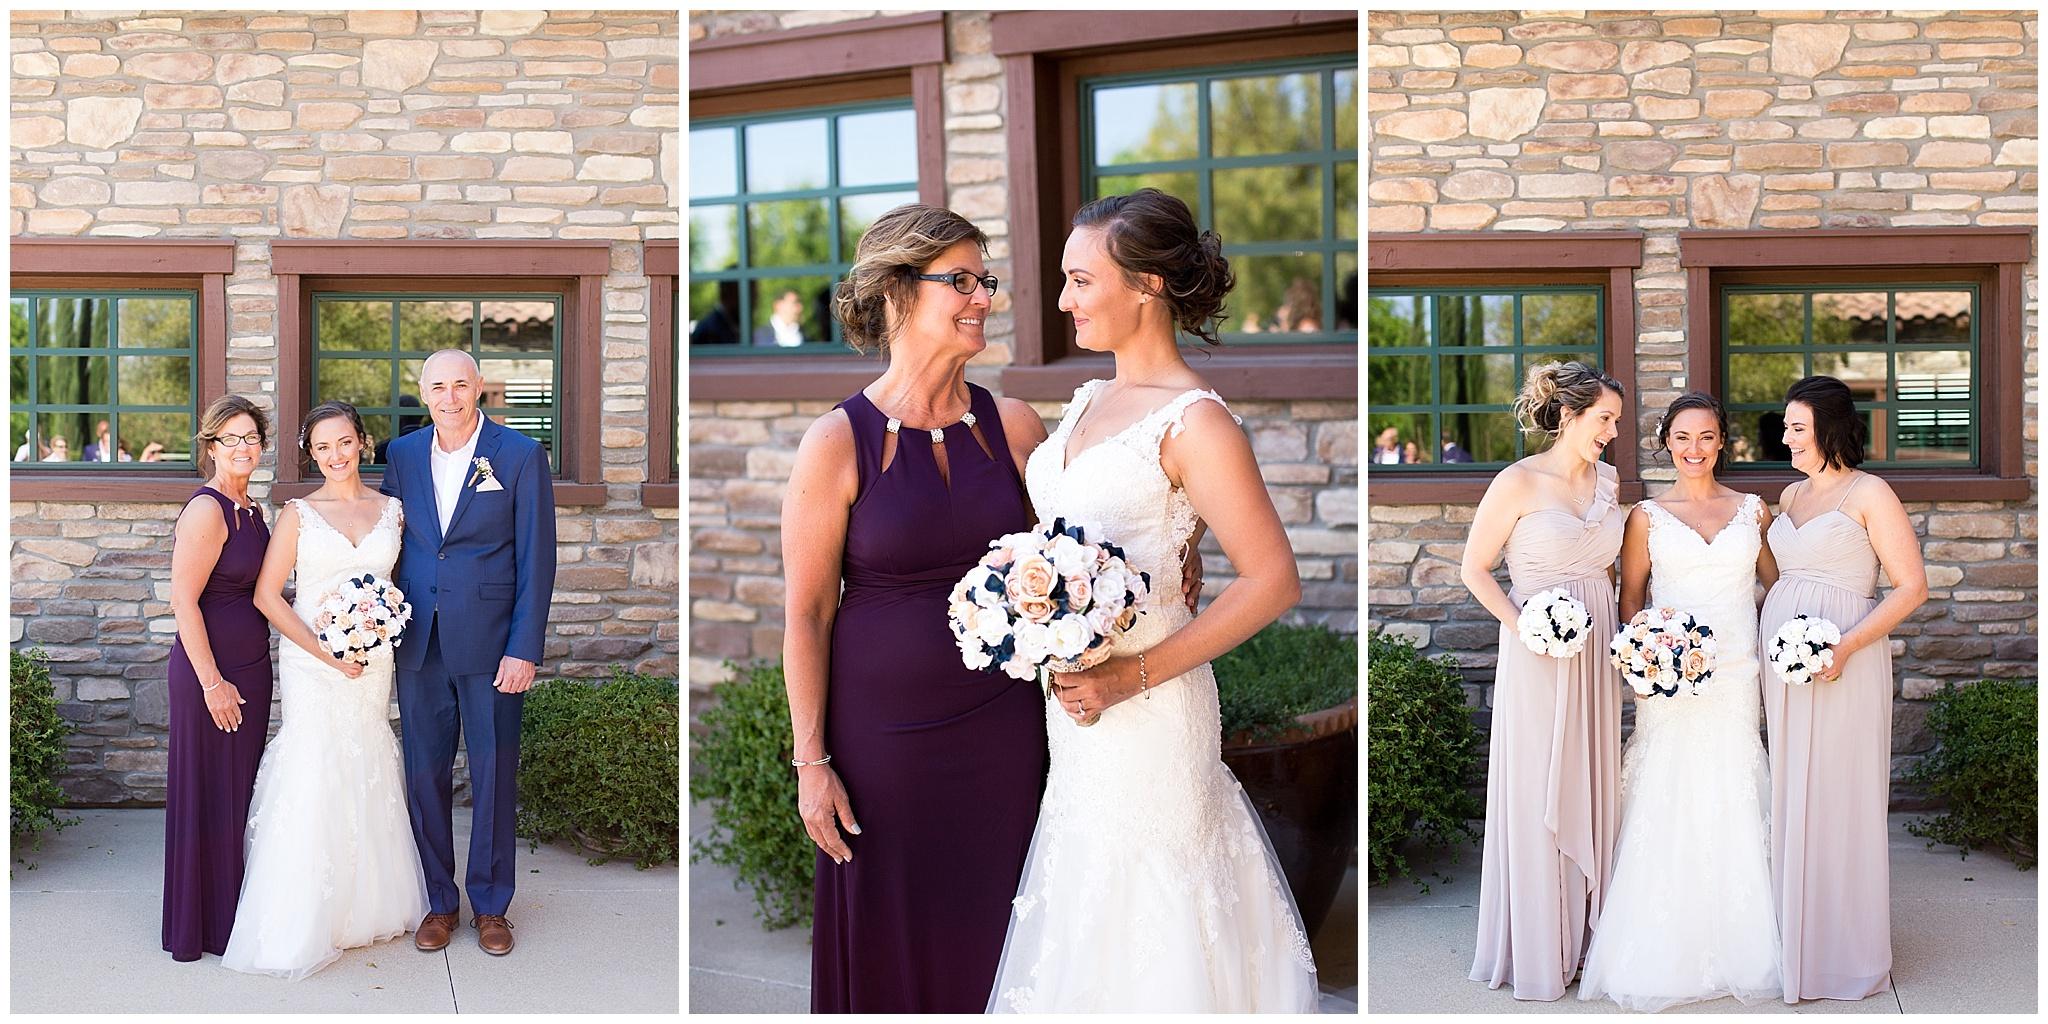 Vinny-Cayt-Wedding-04-26-18-1102.jpg